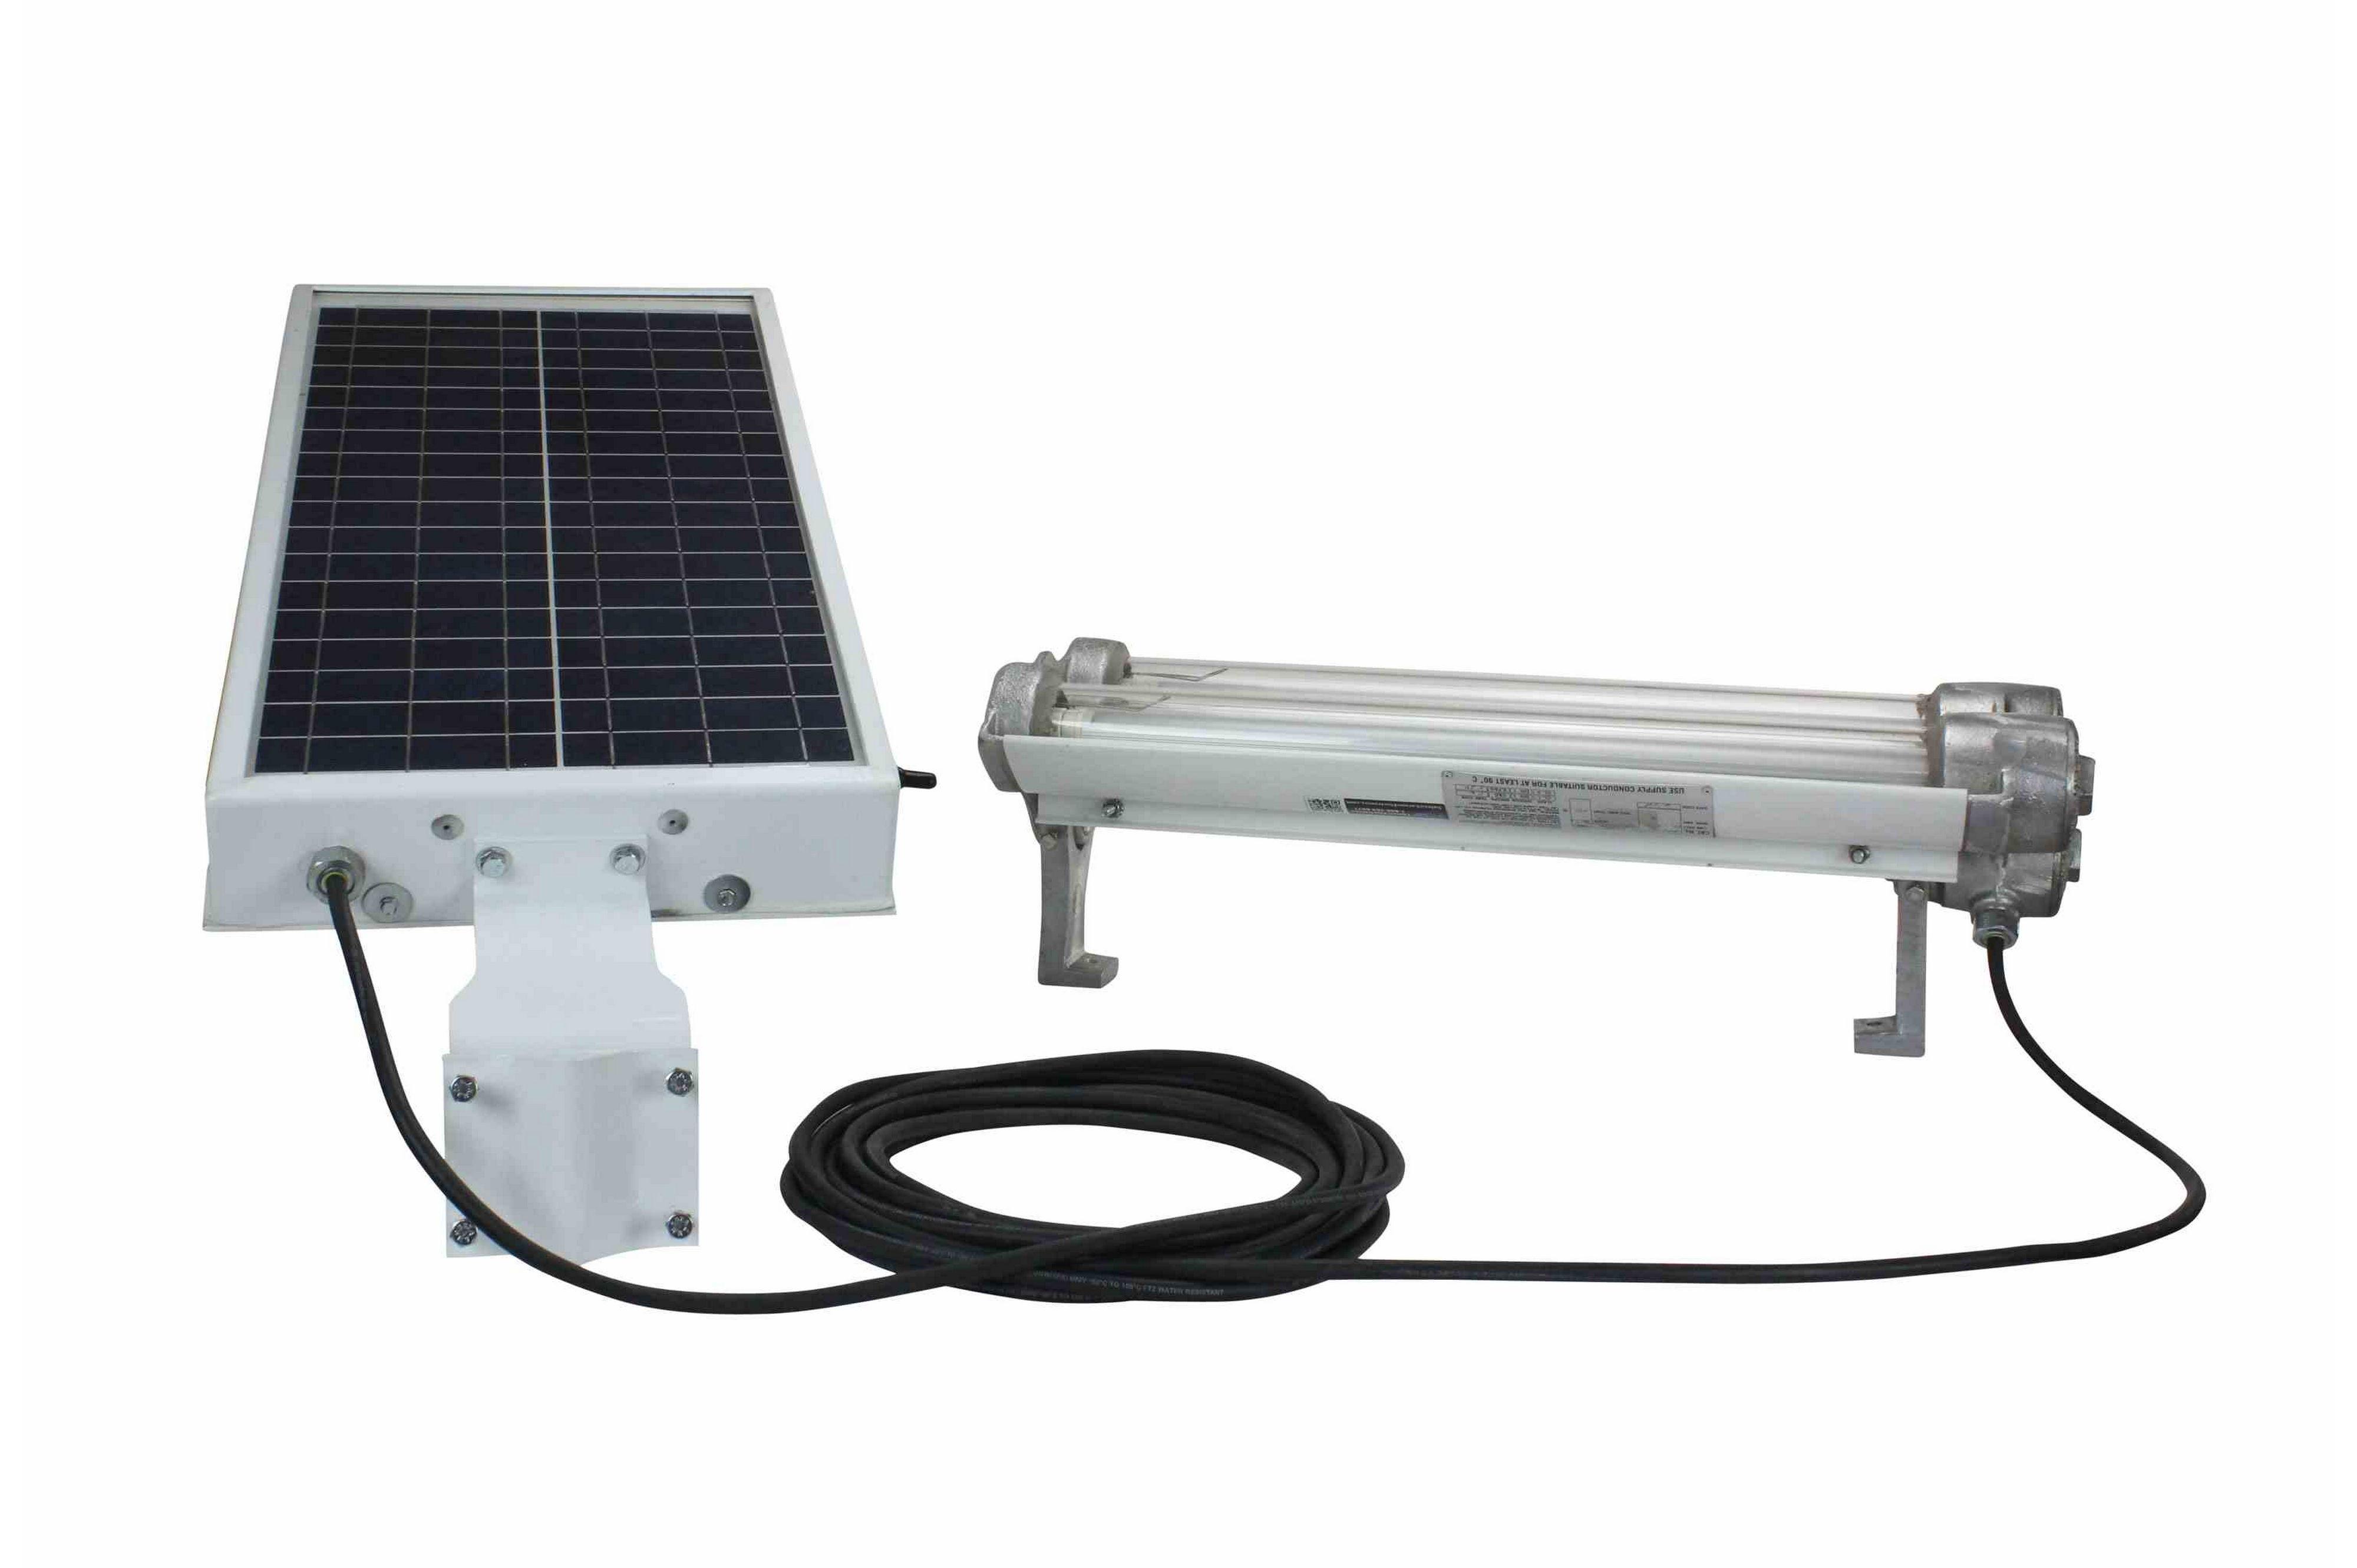 Solar Powered Explosion Proof Led Lighting C1d1 2ft